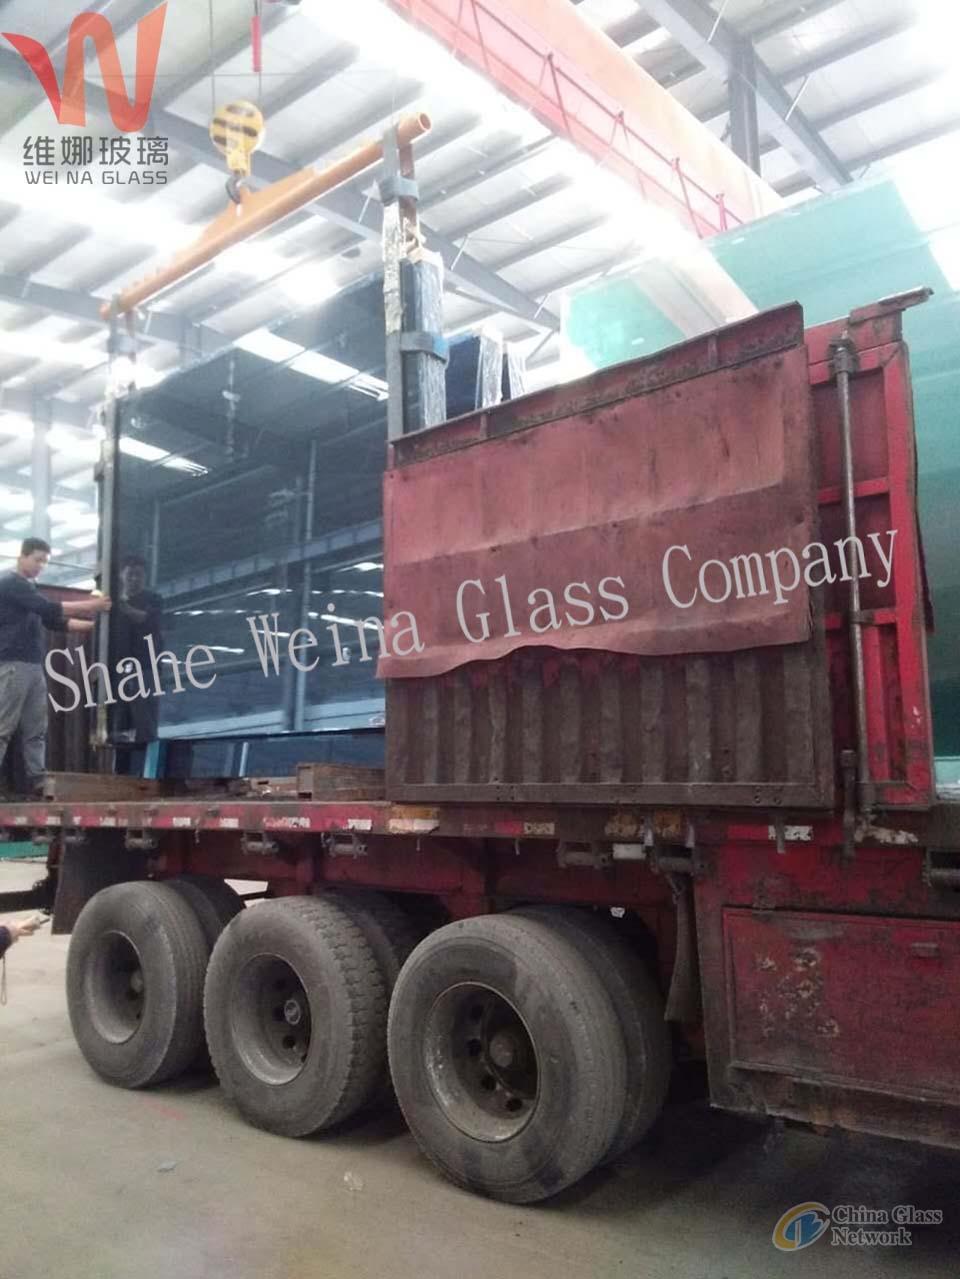 5mm Ford blue coated glass, Vina glass